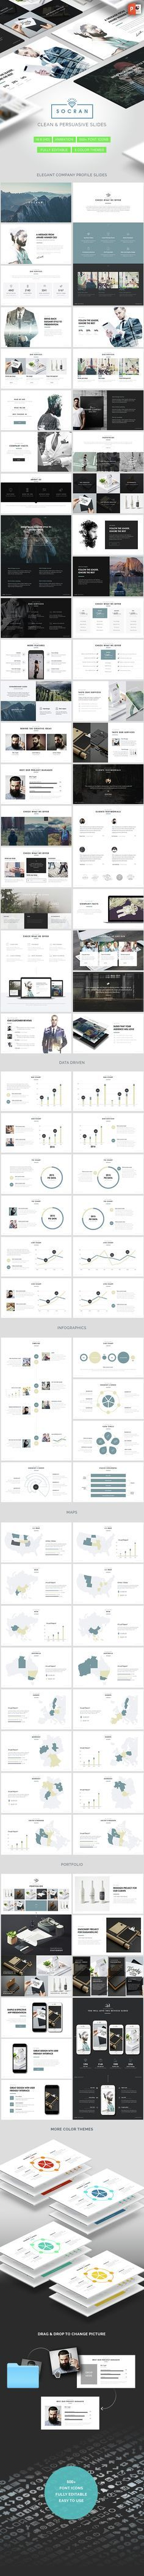 SOCRAN - Clean & Modern Powerpoint Template (PowerPoint Templates)